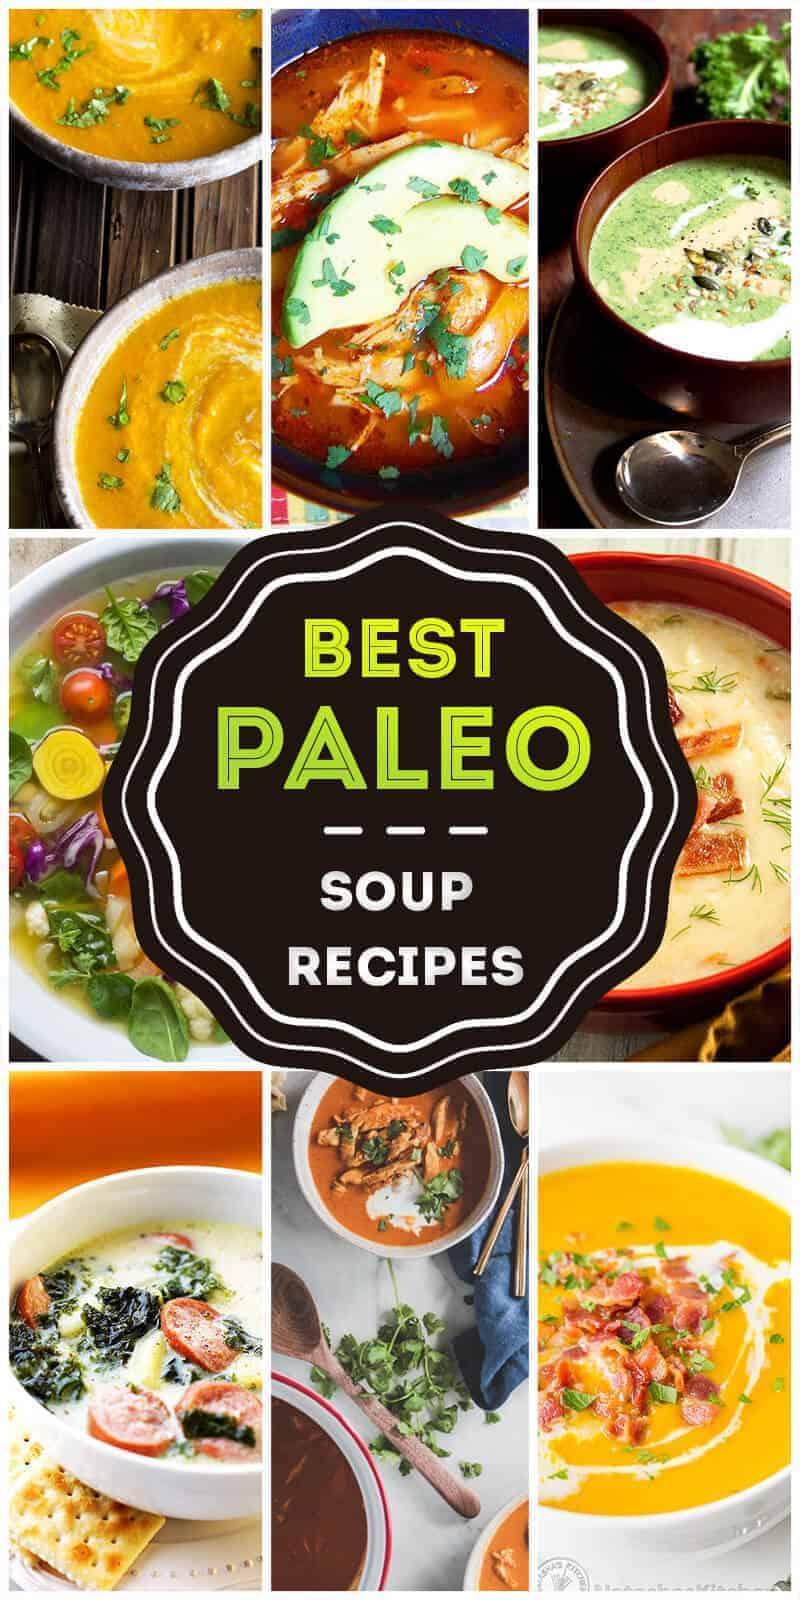 Best Paleo Soup Recipe Ideas